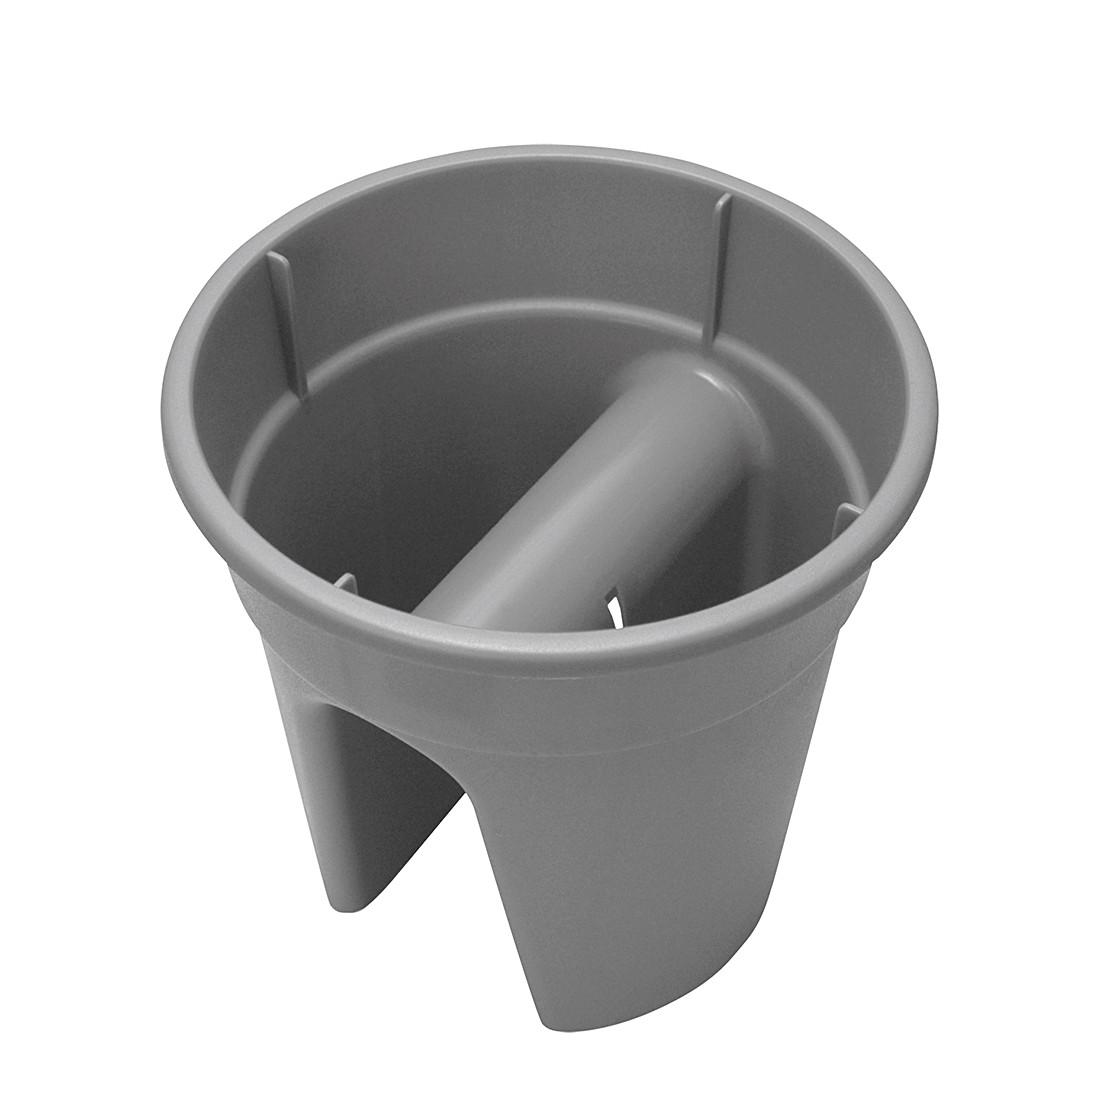 Blumentopf Flowerclip (3er-Set) – Kunststoff Grau, Khw bestellen